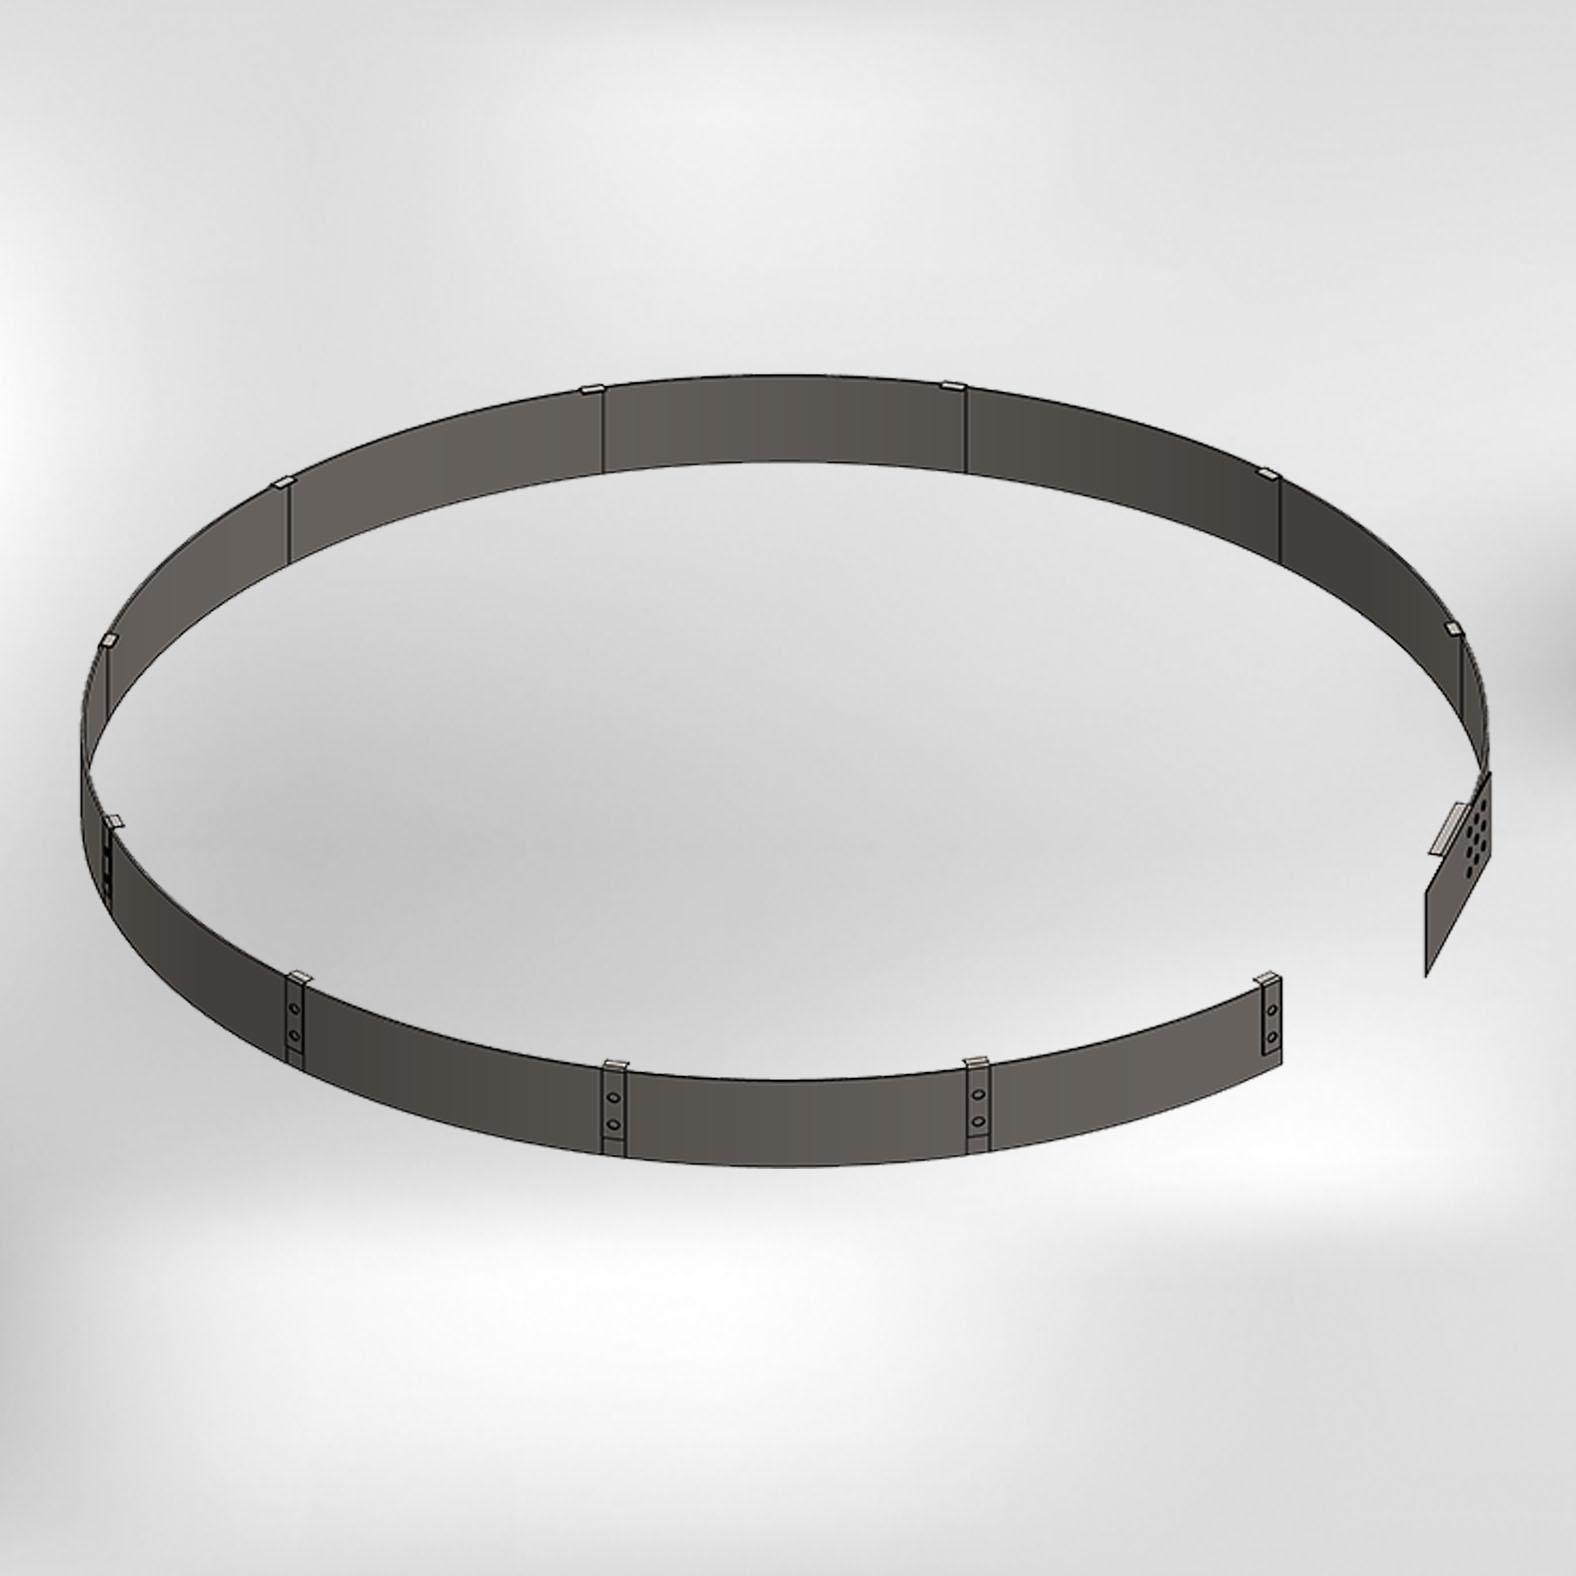 M1A1 Band